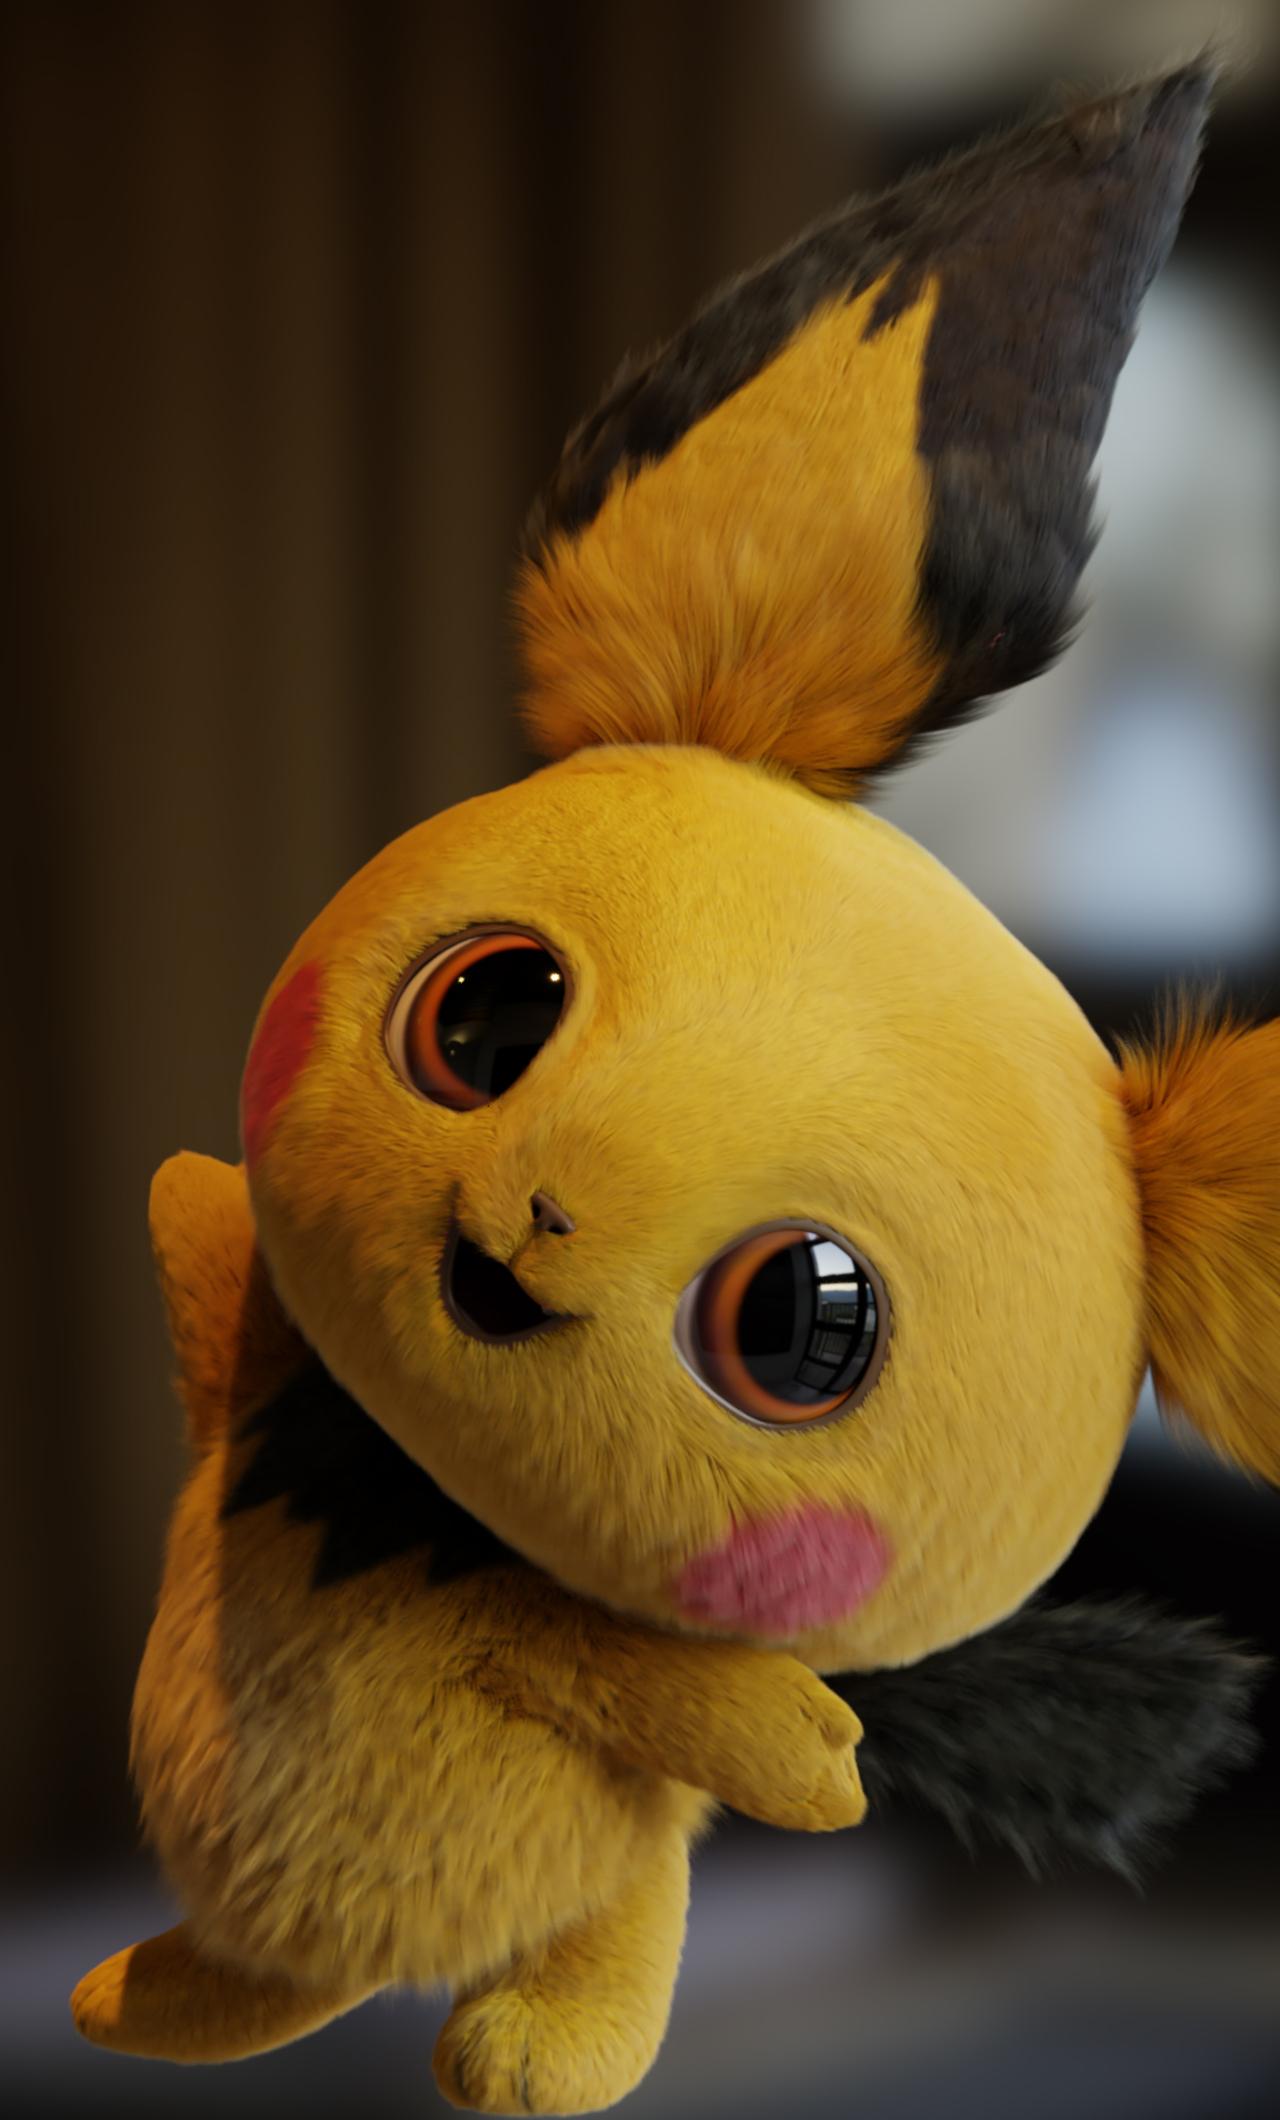 Download Pikachu Wallpaper Hd Iphone Cikimm Com